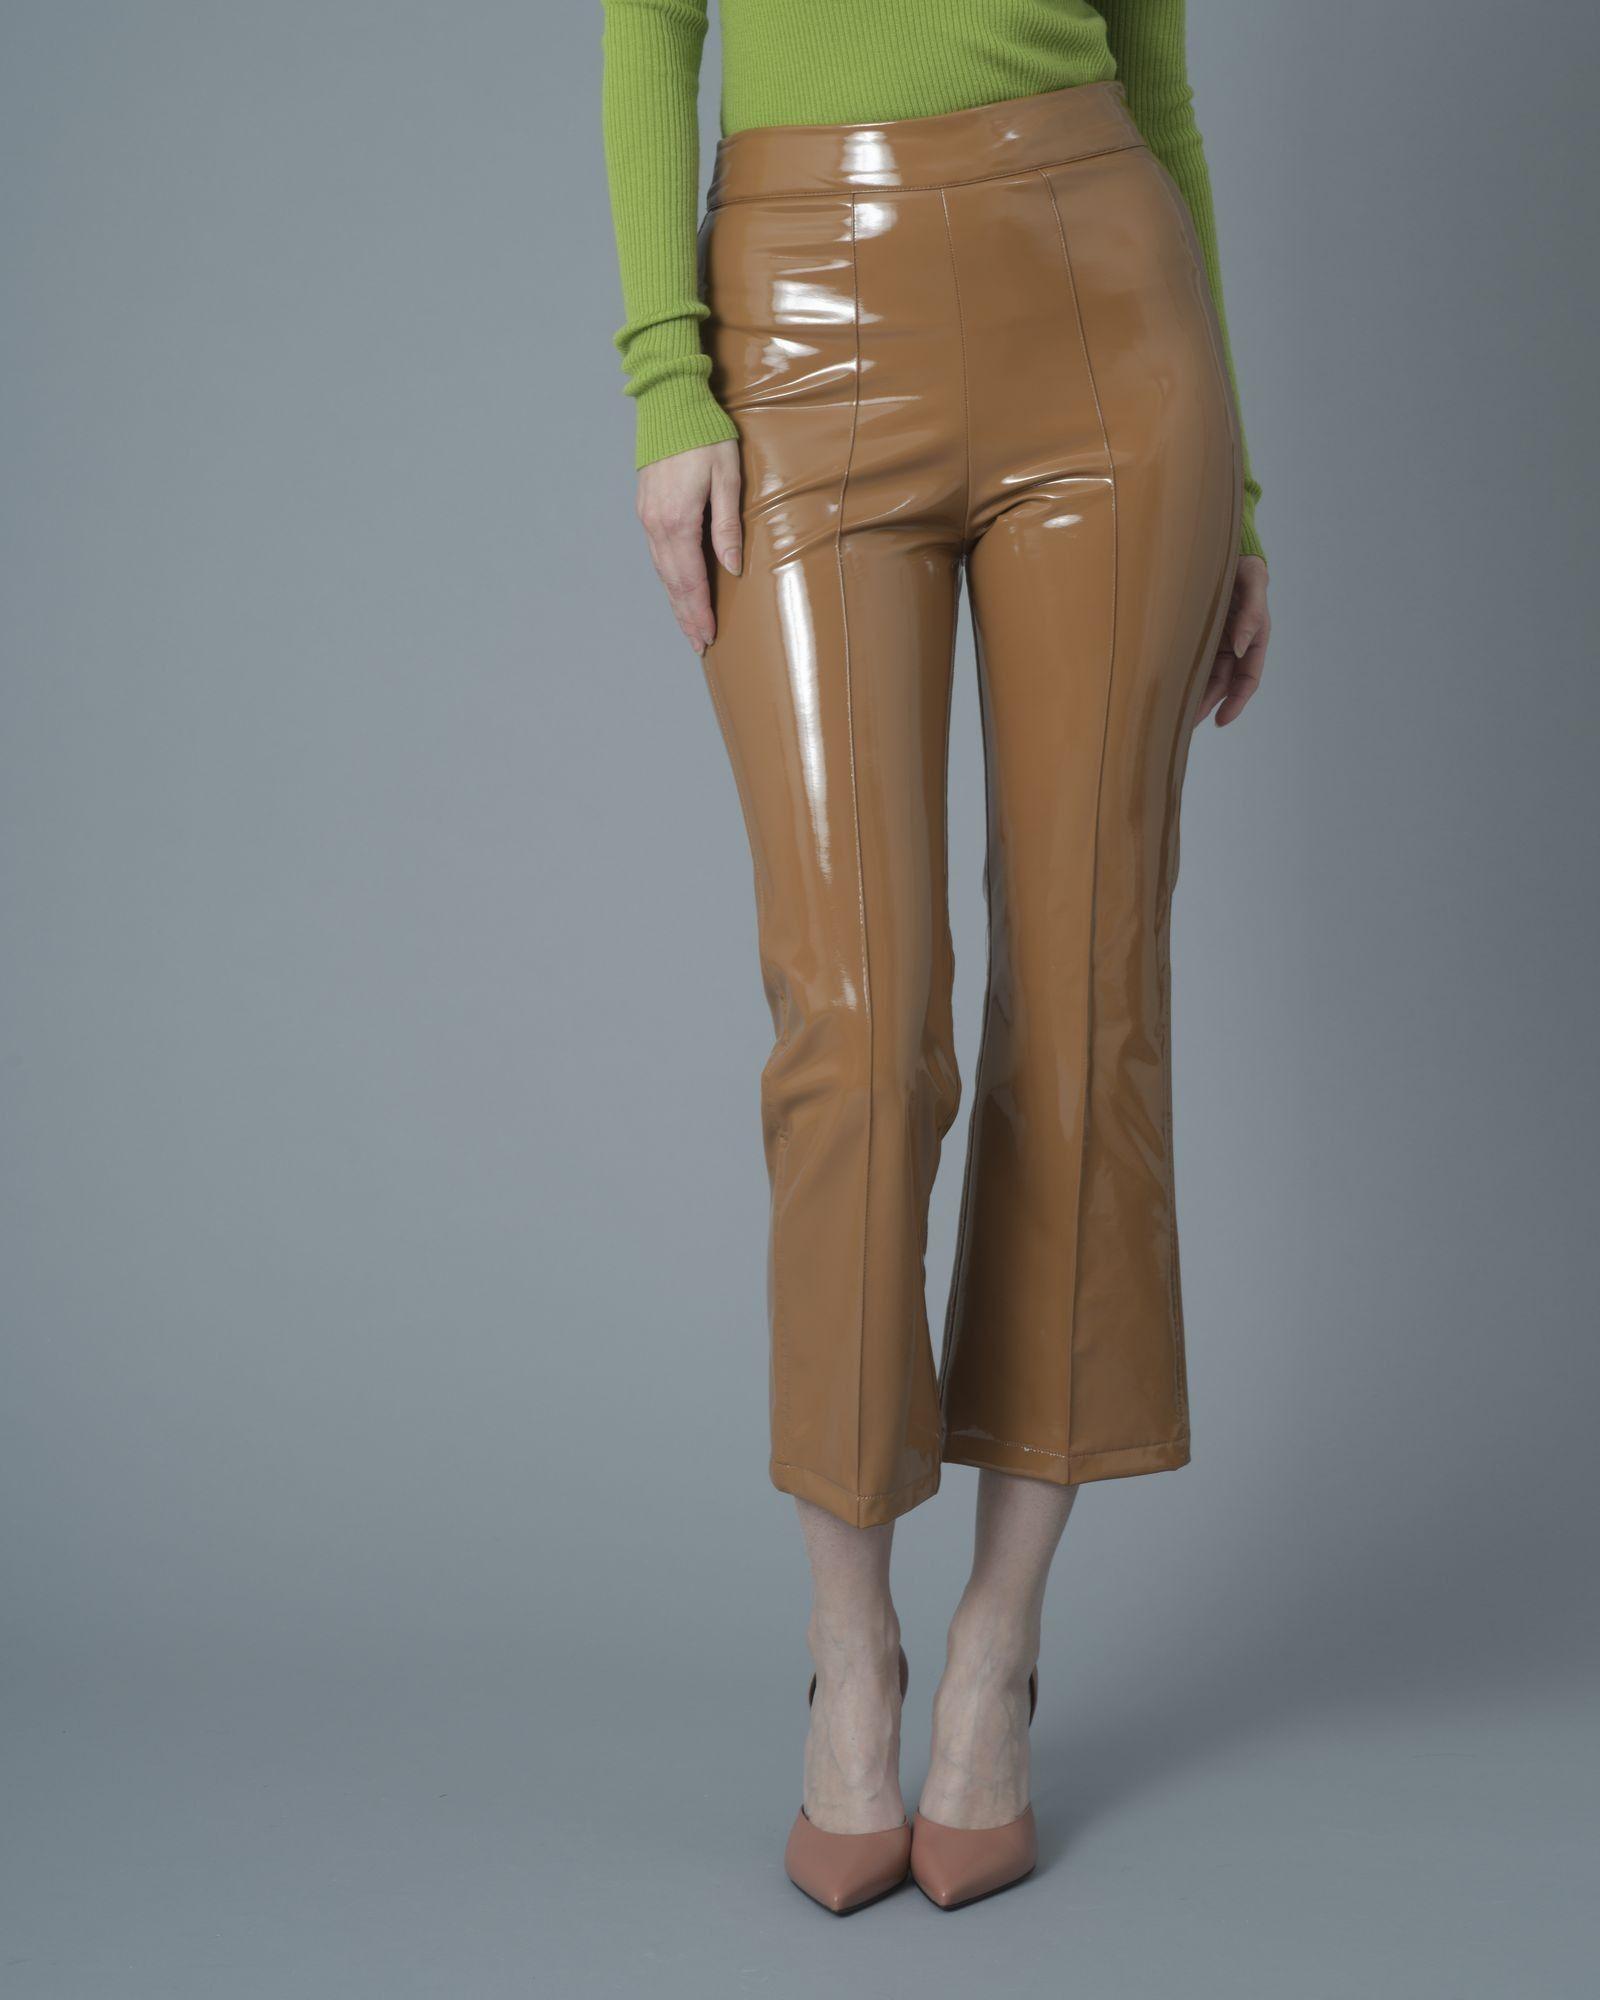 Pantalon évasé simili cuir camel Jijil